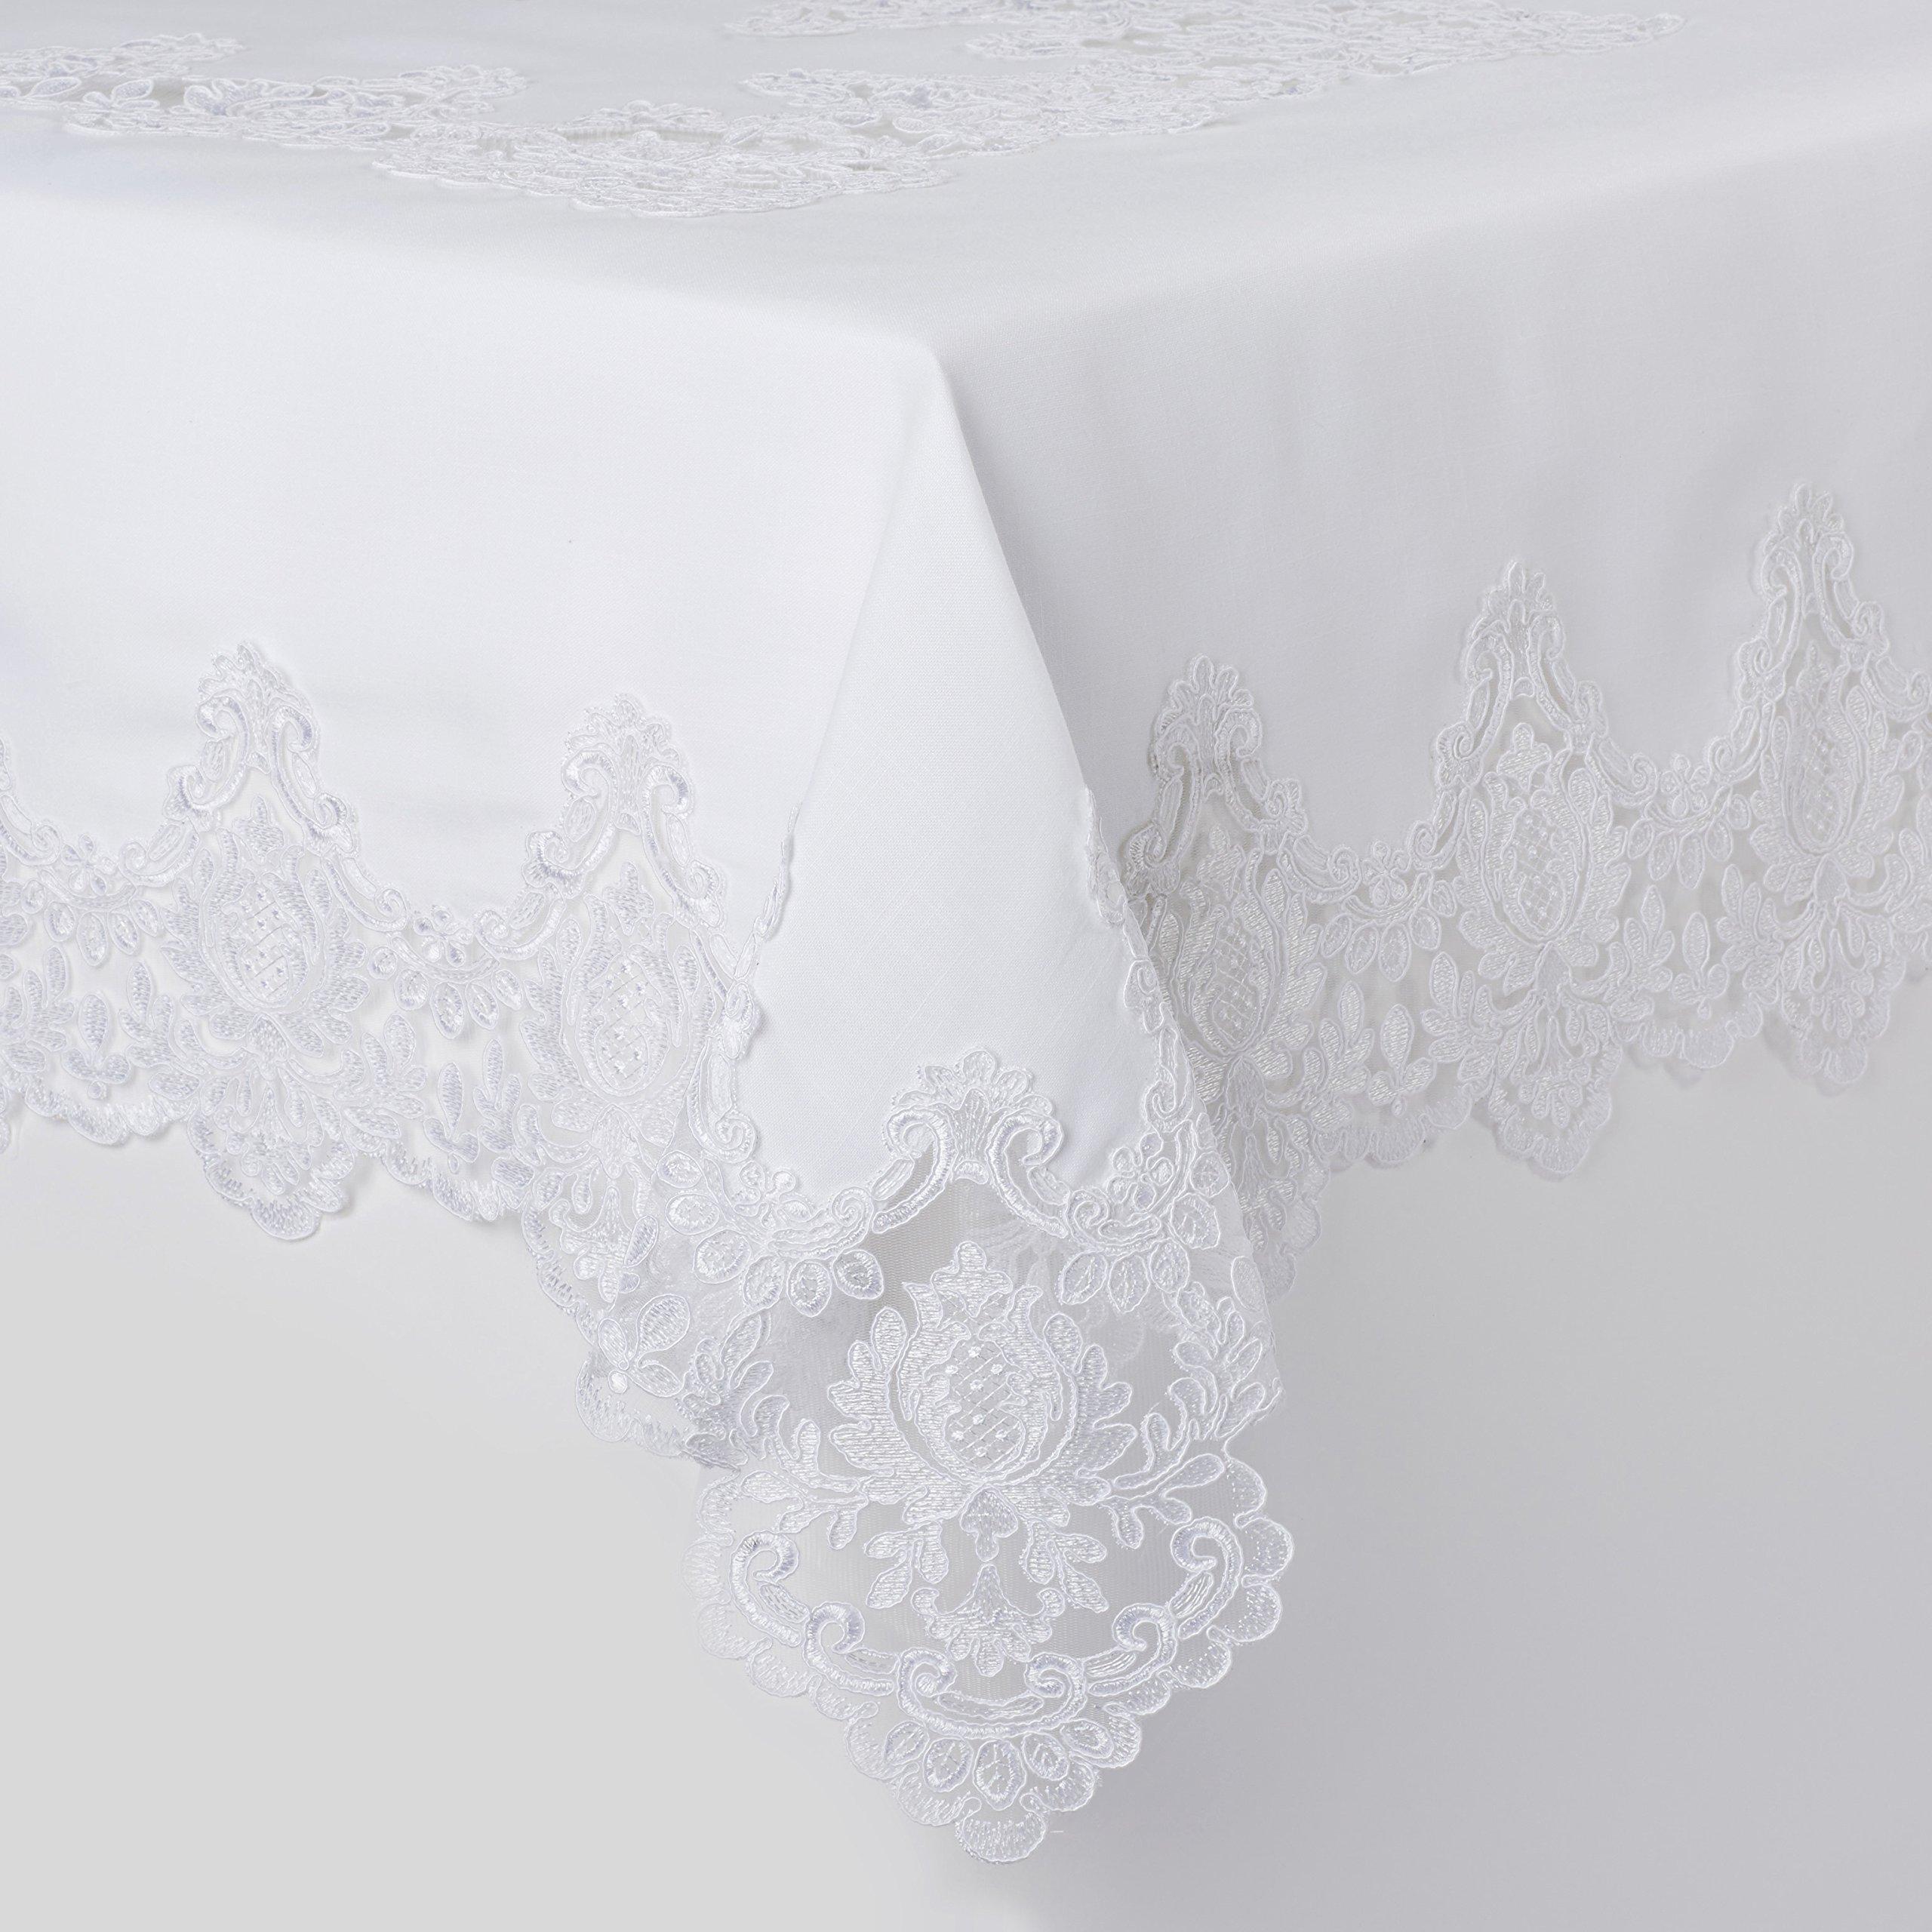 Violet Linen Imperial Embroidered Vintage Lace Design Oblong/Rectangle Tablecloth, 70'' x 180'', White by Violet Linen (Image #1)